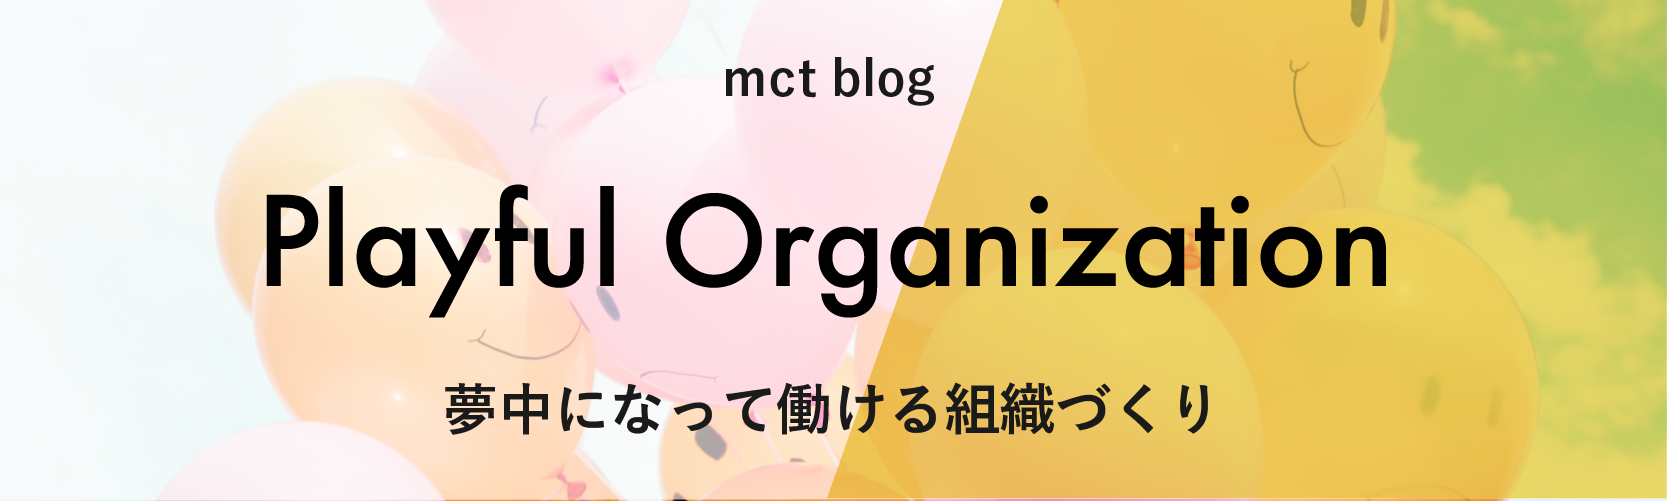 Playful Organization